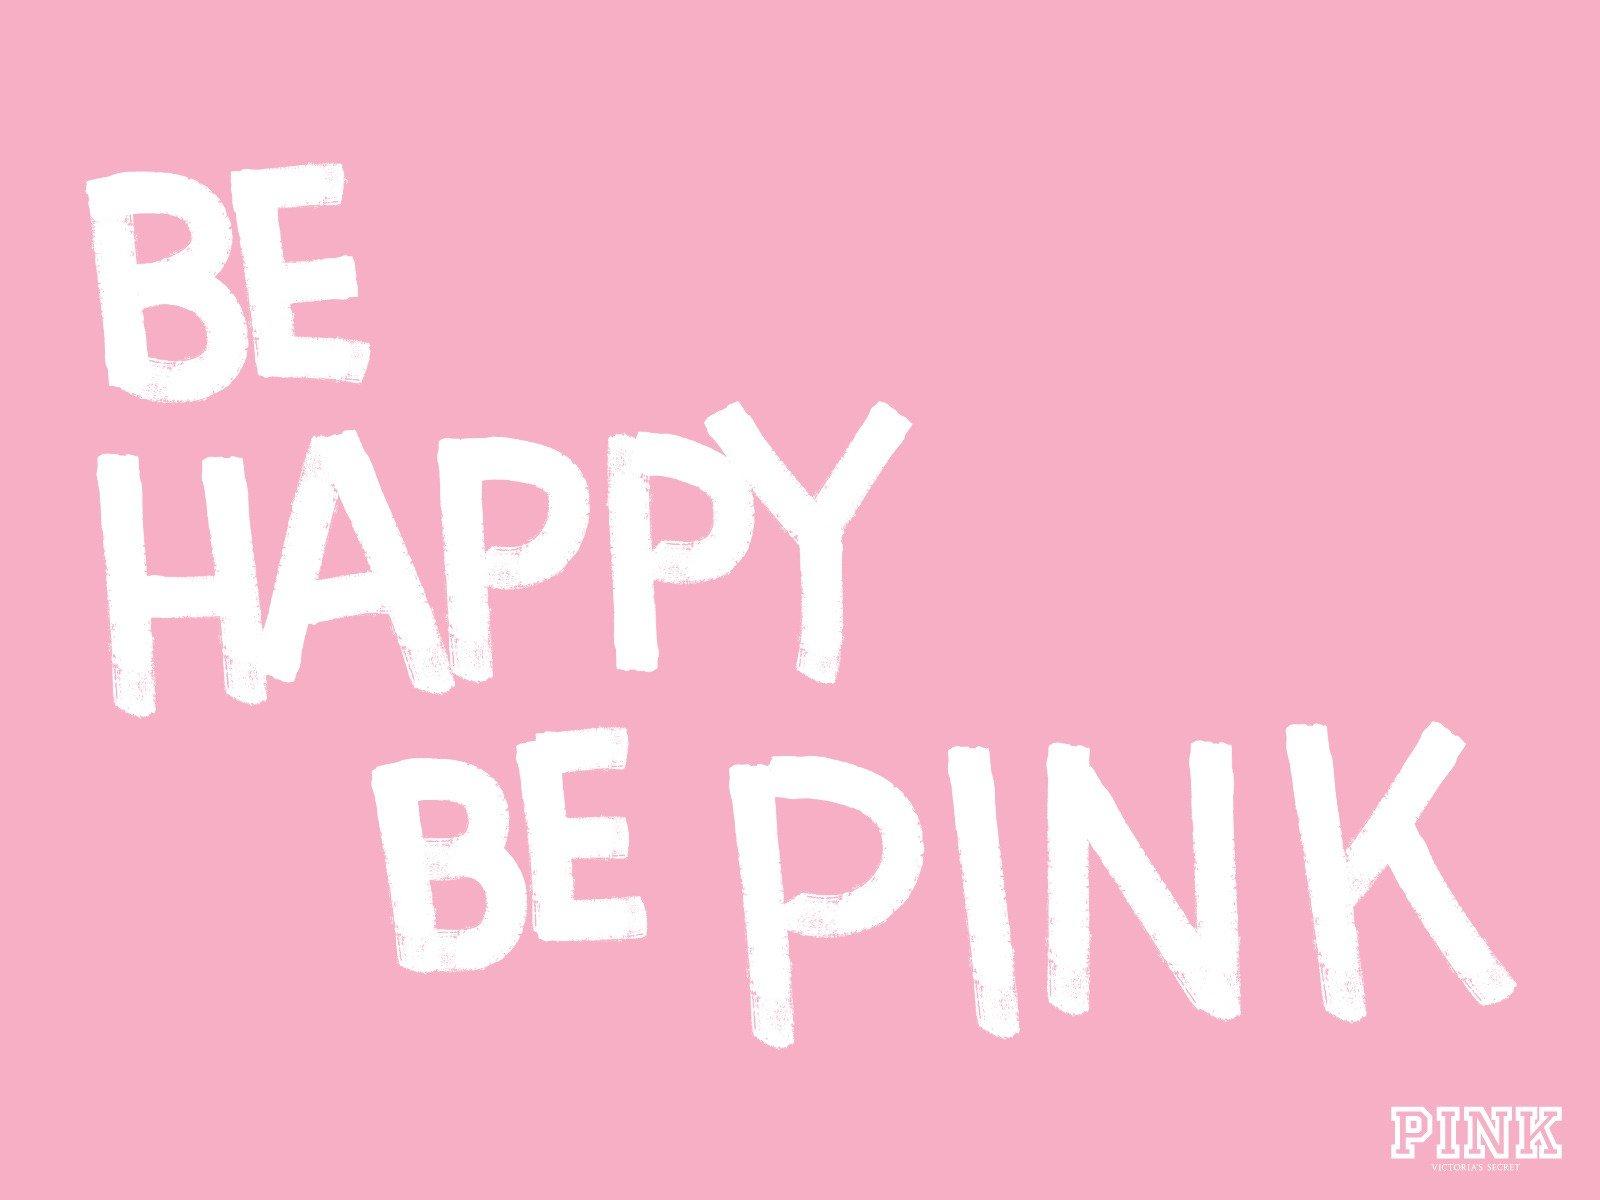 Pink happy victorias secret be happy wallpaper  1600x1200  301836  WallpaperUP